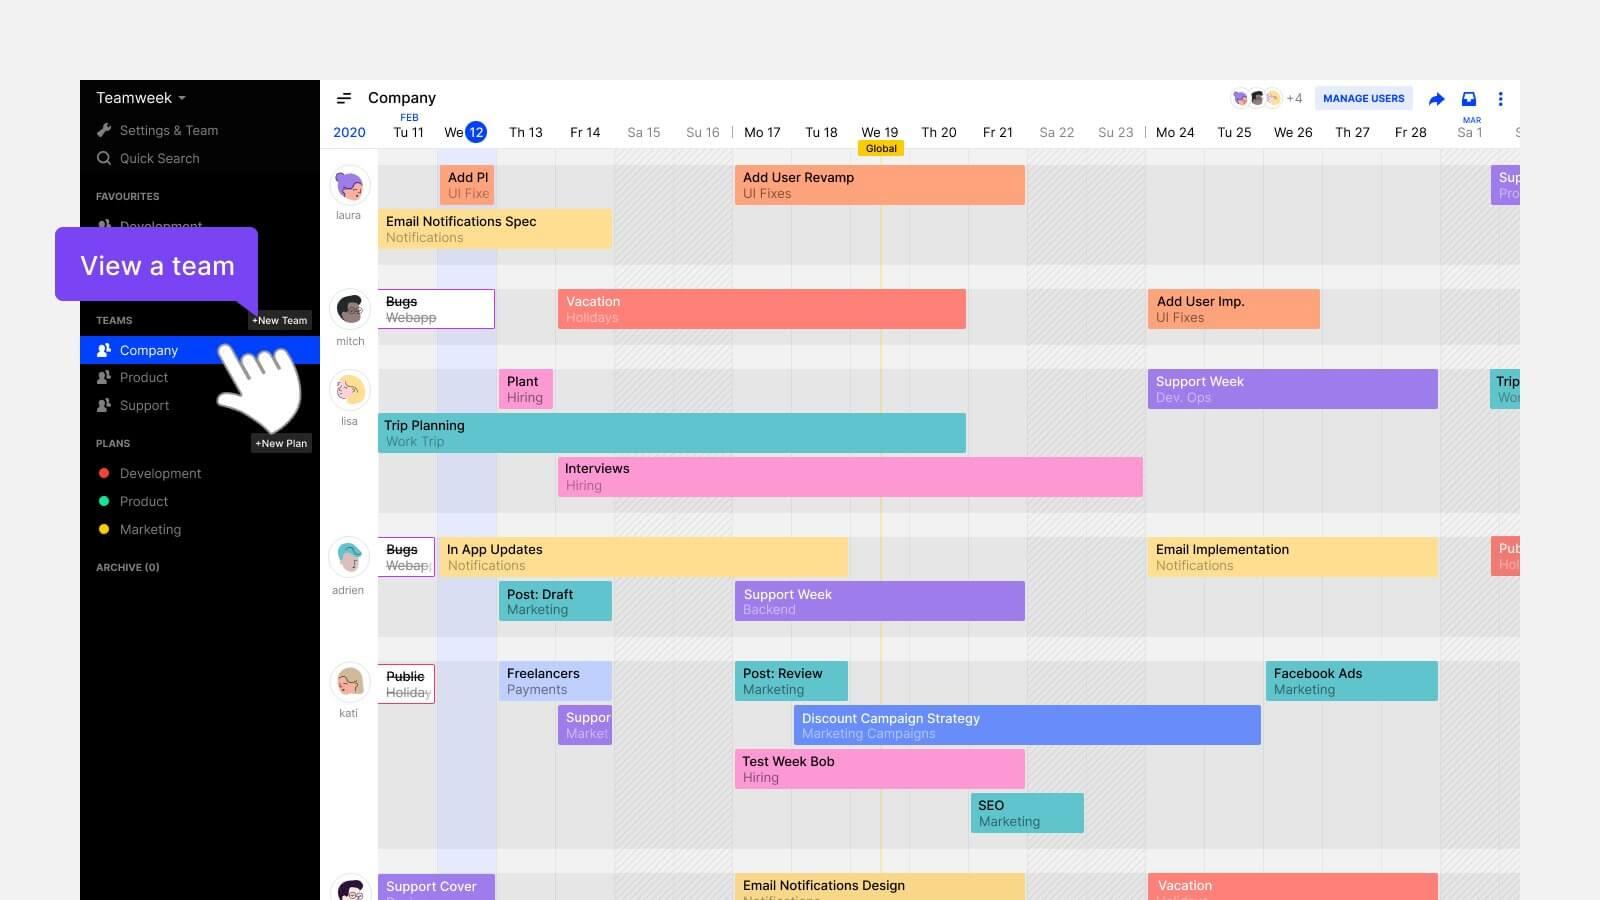 setting up quarterly plans in Teamweek